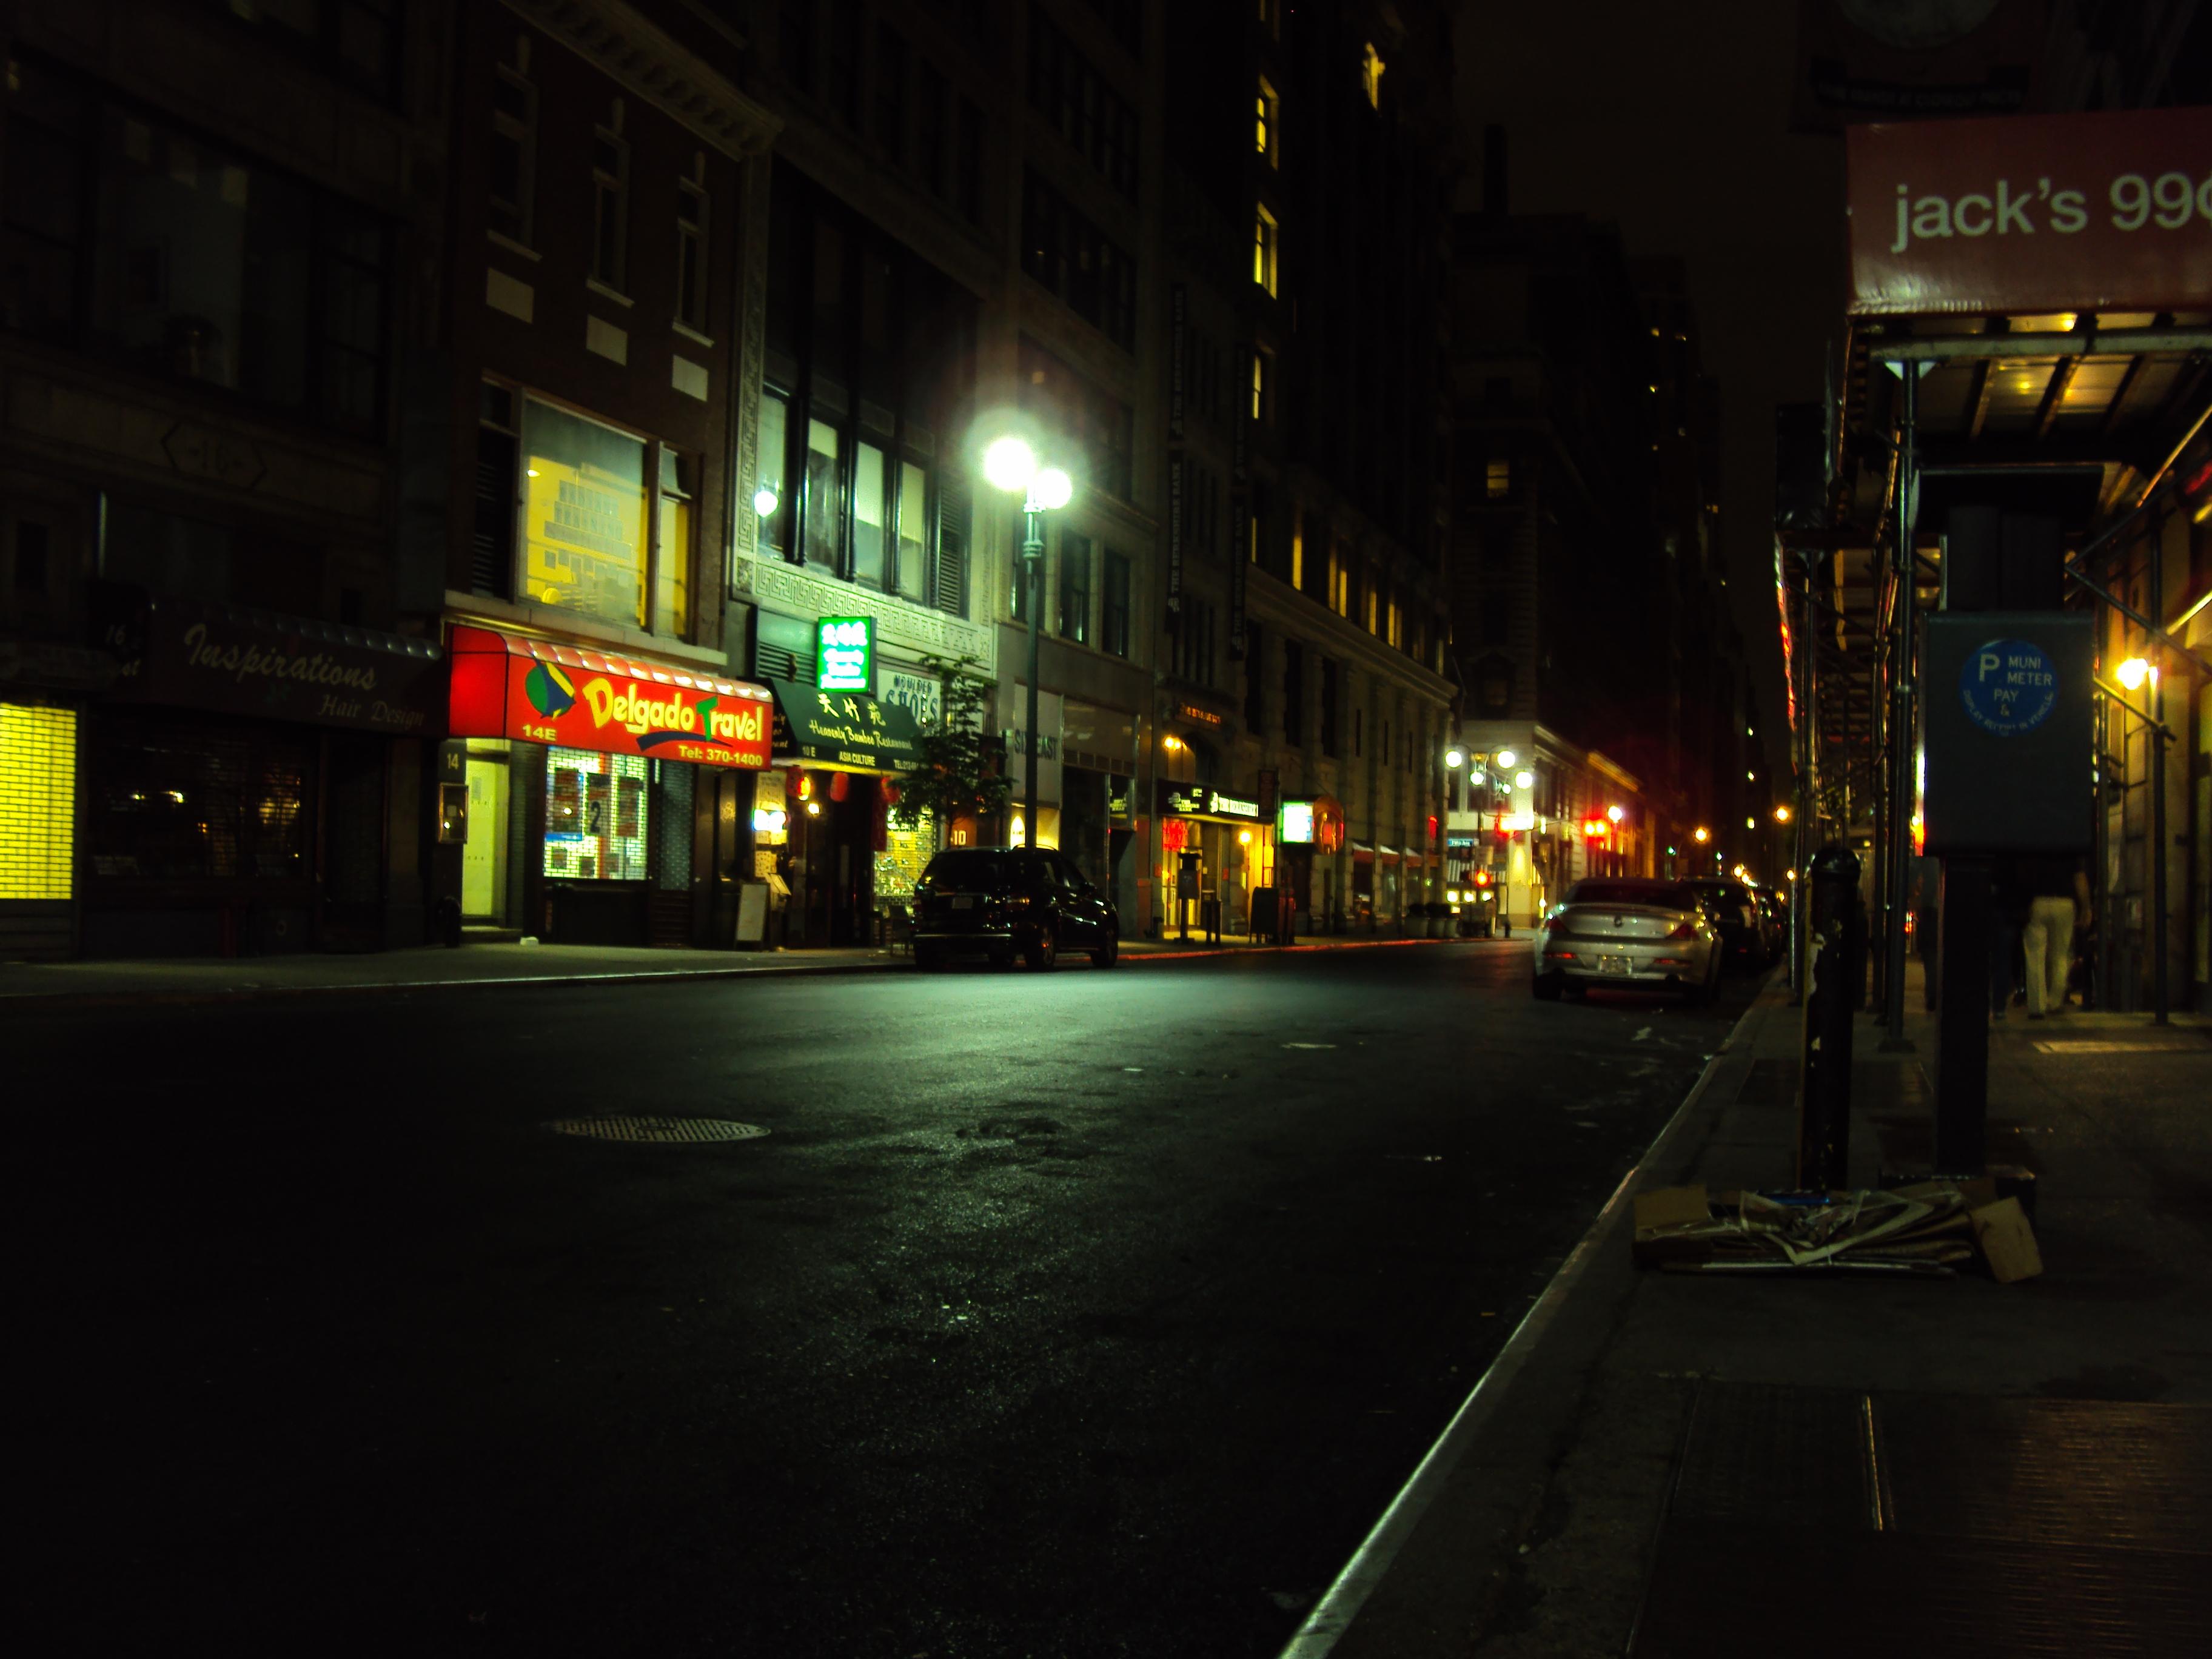 FileJacks 99 Cents In Manhattan 4579820844